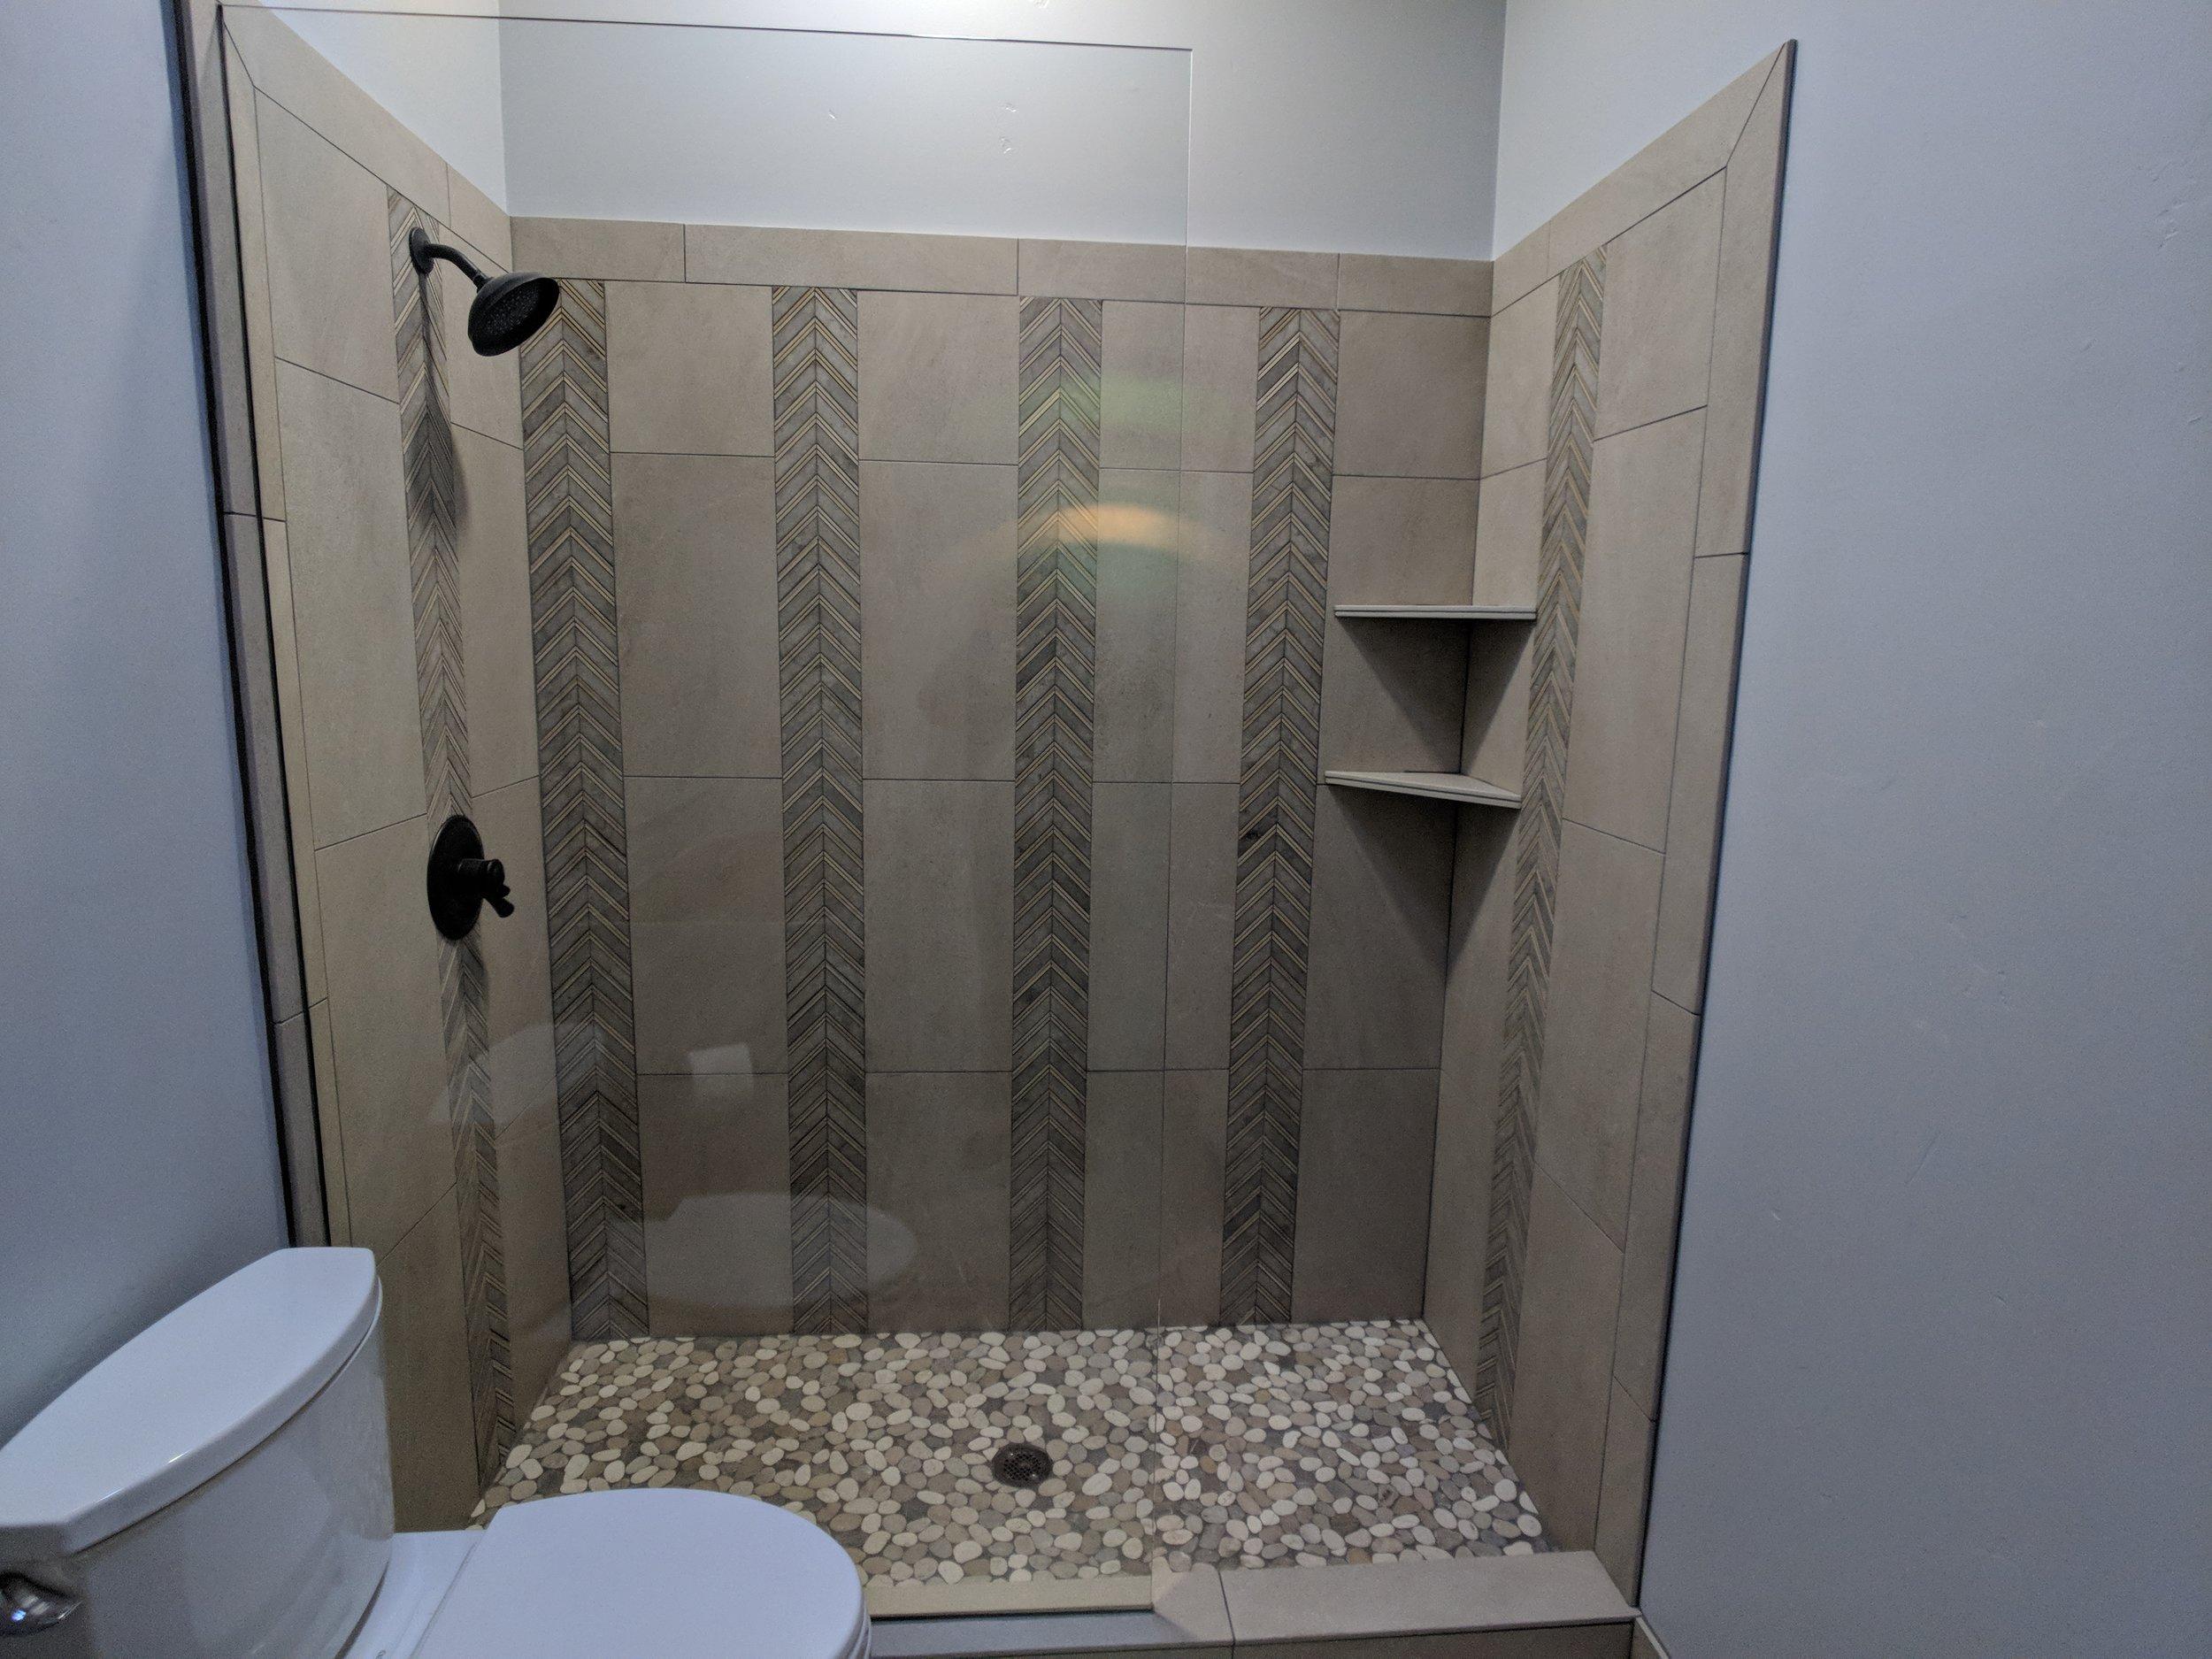 holland-bathroom-shower-pebble-floor.jpg